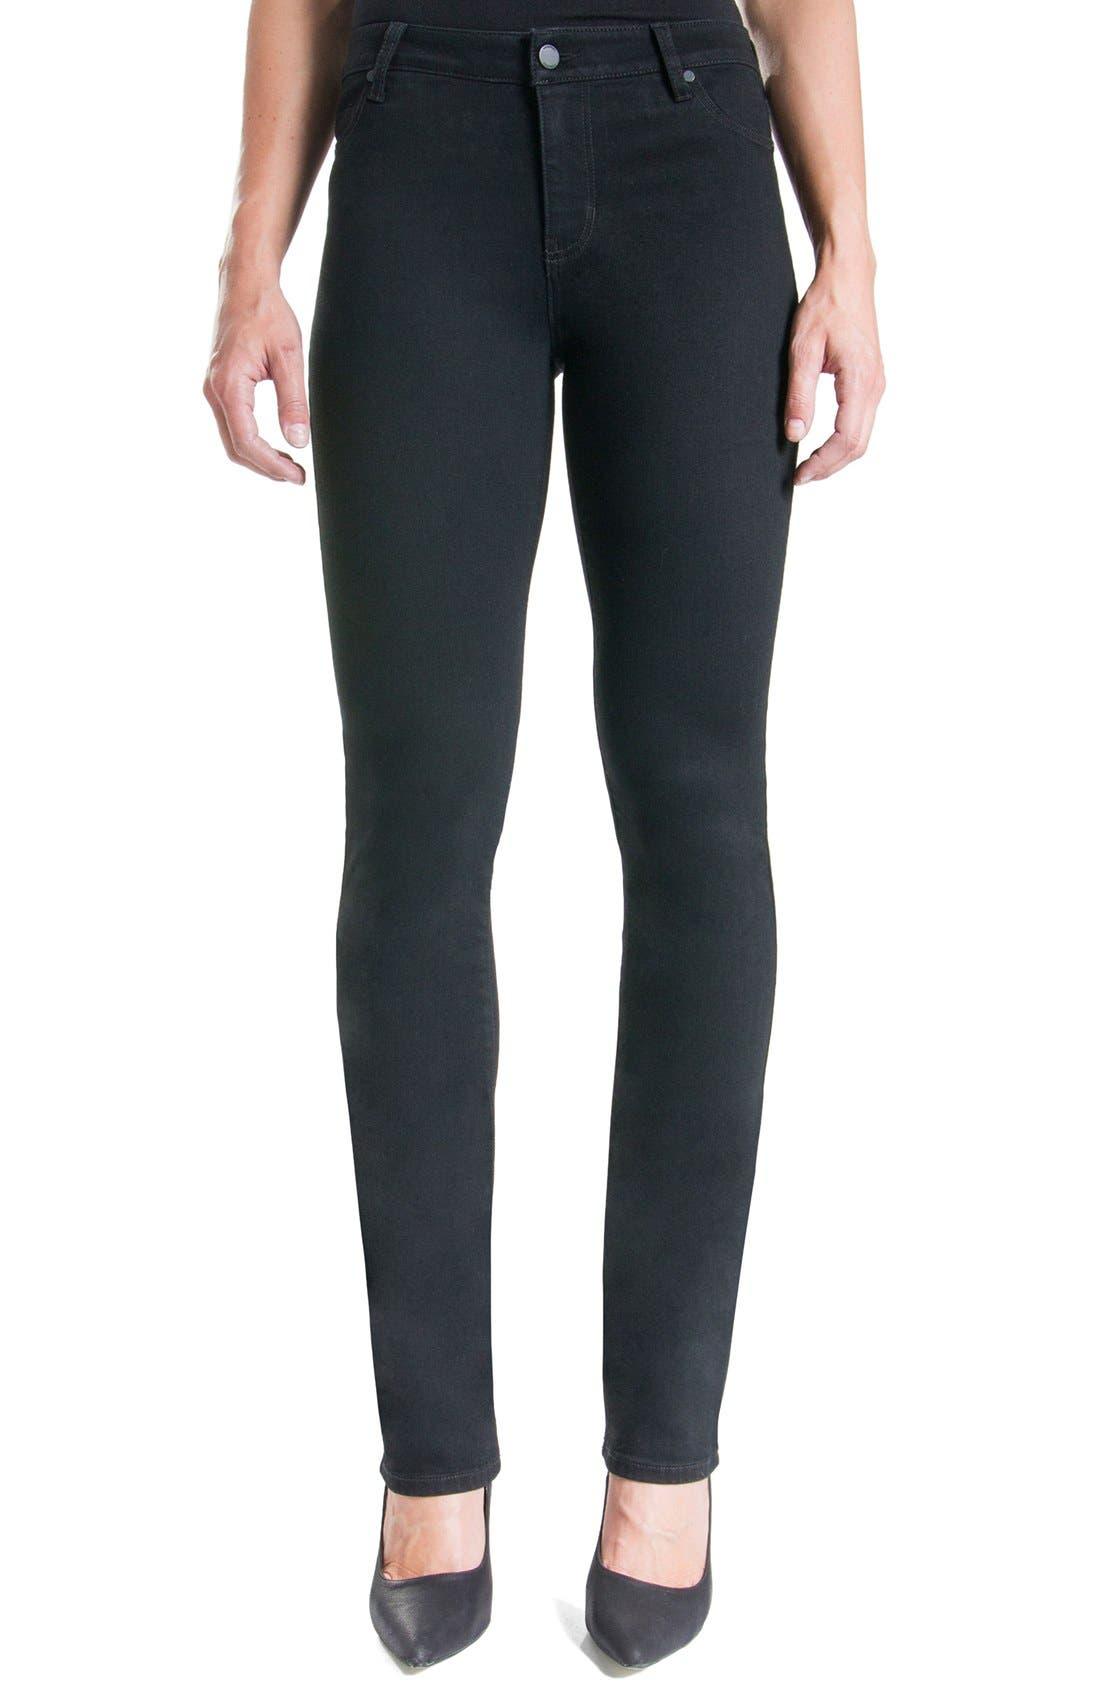 Liverpool Jeans Company Sadie Mid Rise Stretch Straight Jeans (Black Rinse) (Regular & Petite)